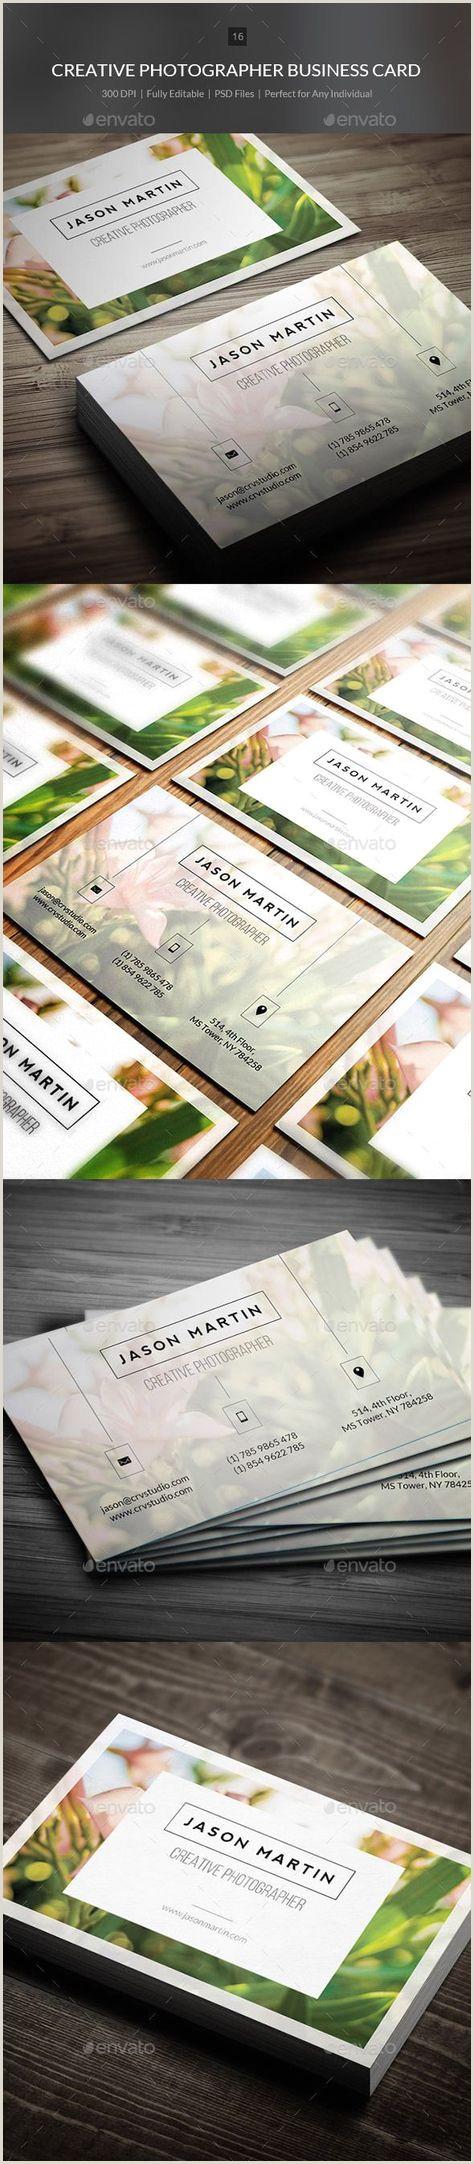 Unique Business Cards For Photographers 40 Trendy Ideas Photography Business Cards Template Creative